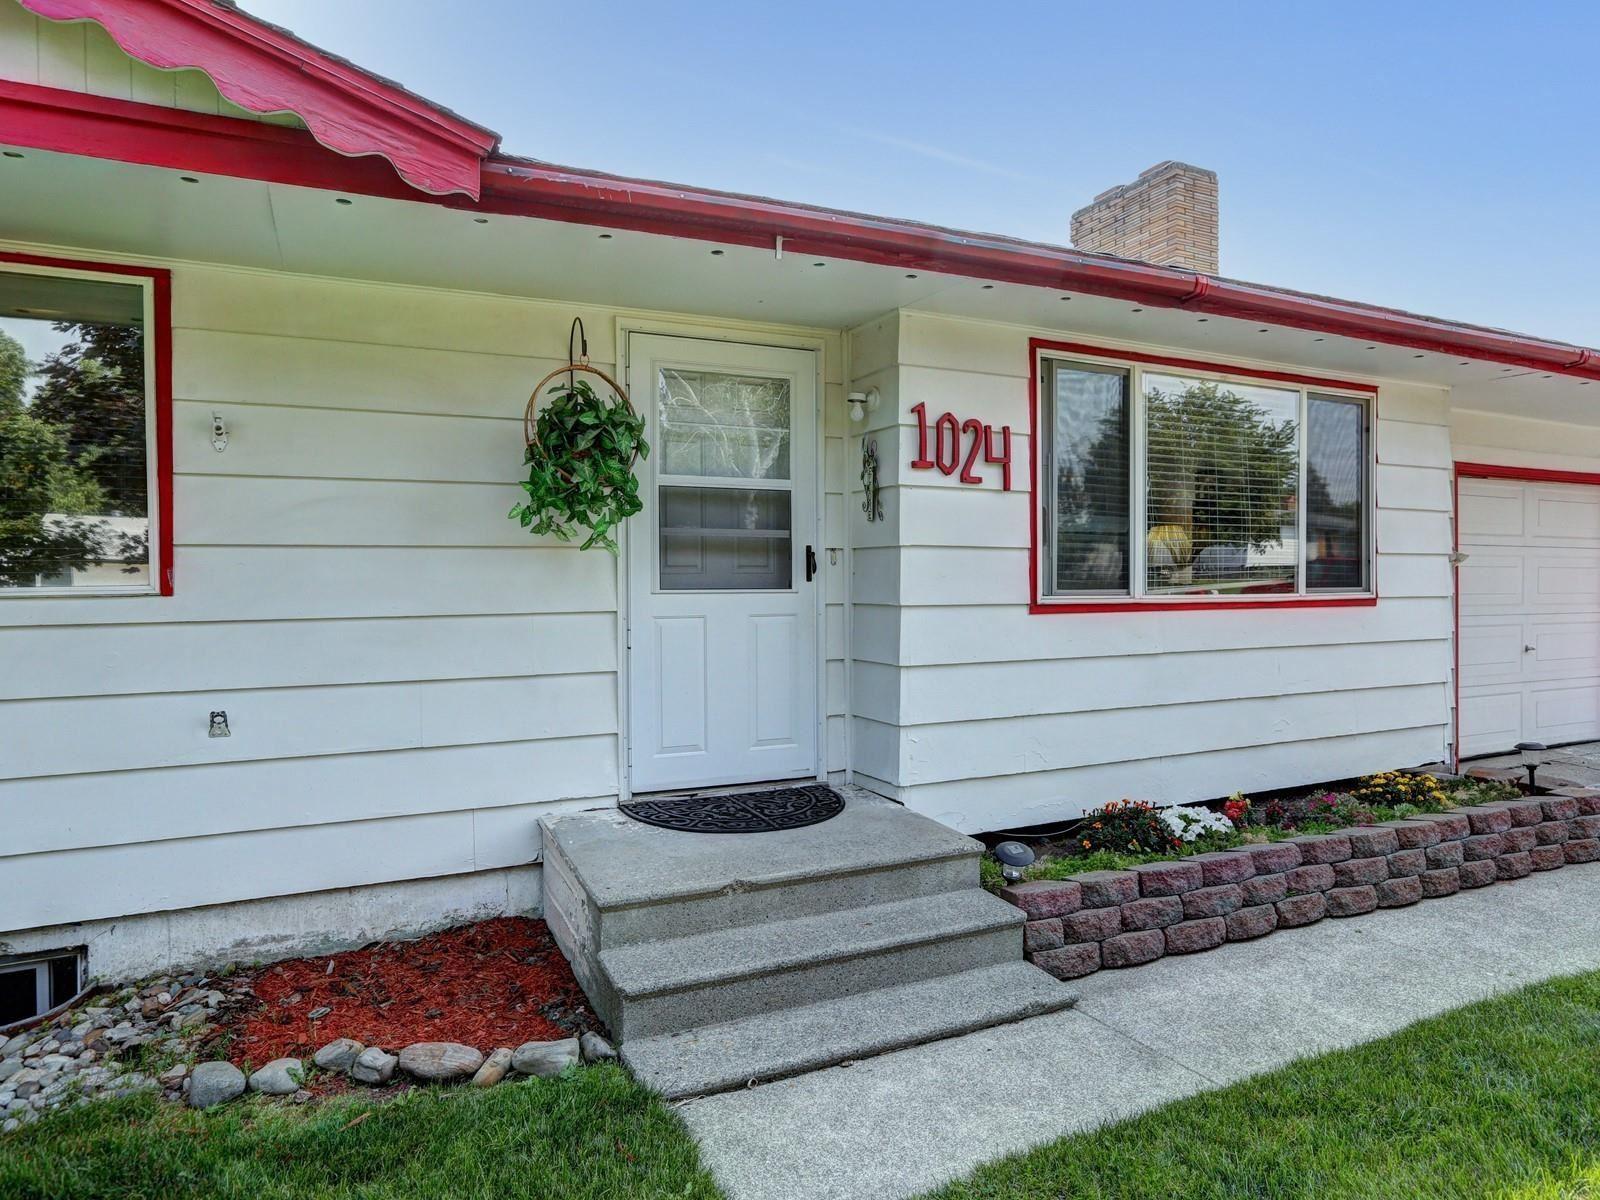 1024 N St. Charles Rd, Spokane Valley, WA 99037 - #: 202119913